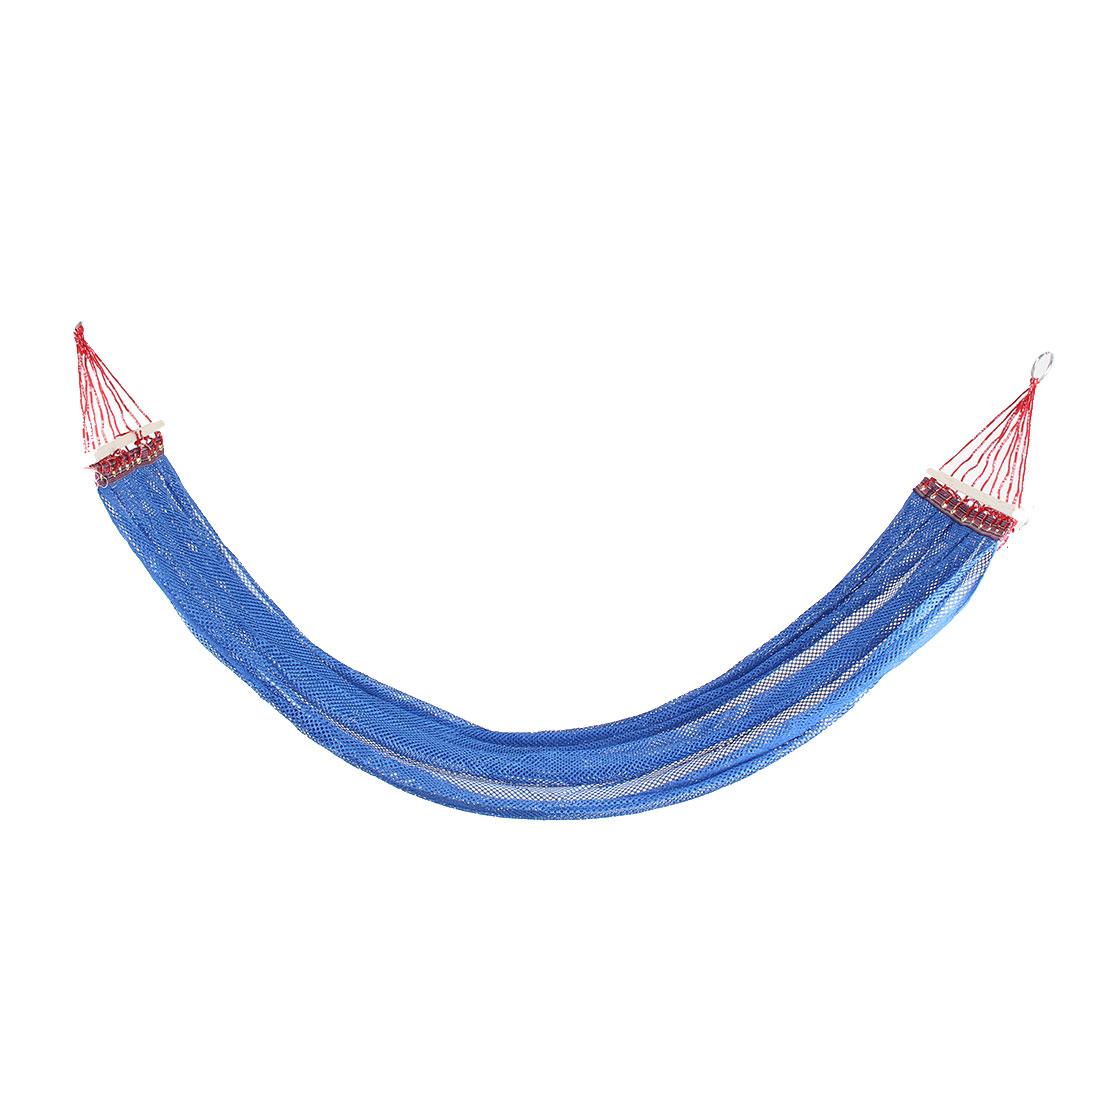 Beach Travel Hiking Nylon Mesh Wooden Stick Swing Hanging Bed Suspended Hammock Blue